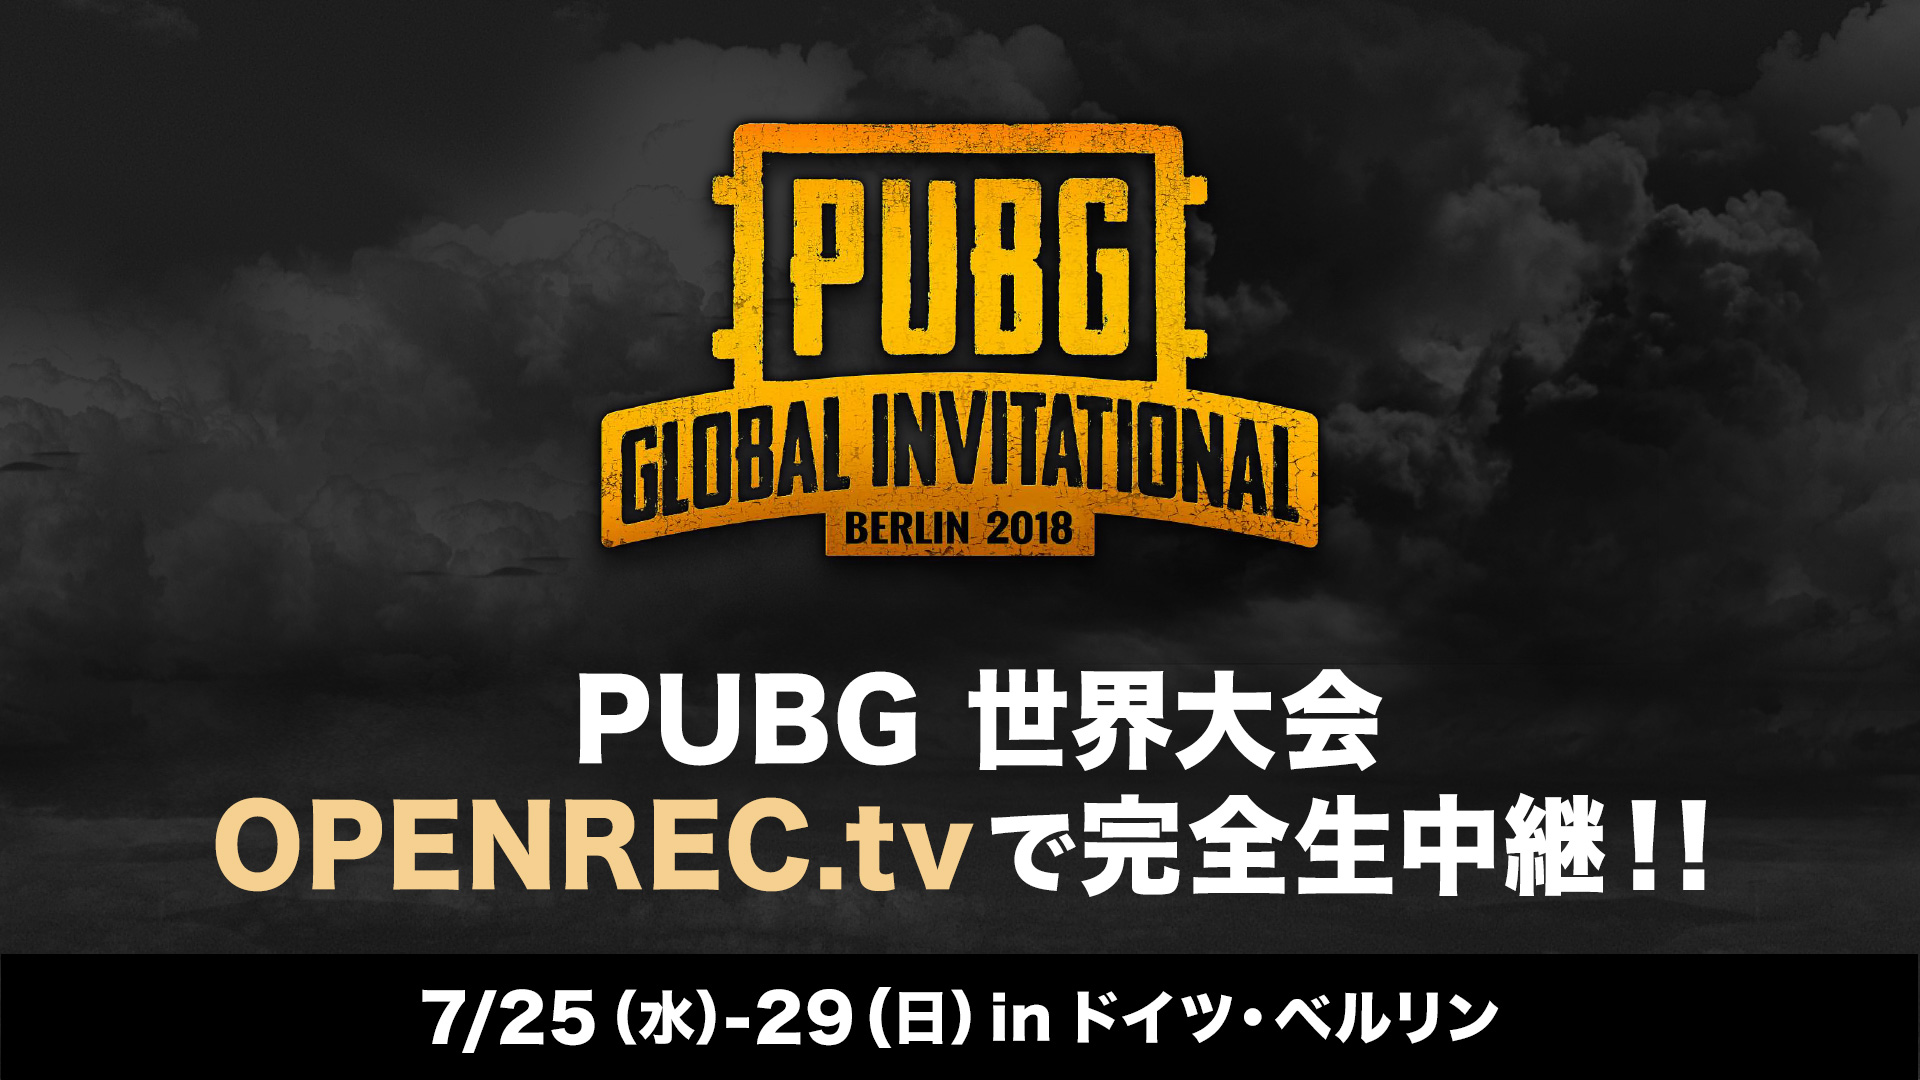 "OPENREC.tvにて、ドイツ・ベルリンで開催される賞金総額200万ドルの「PUBG」世界大会""PUBG Global Invitational 2018(PGI 2018)""を、完全生中継決定!~OPENREC.tvでは日本チーム"" Crest Gaming Xanadu""視点で放送~"